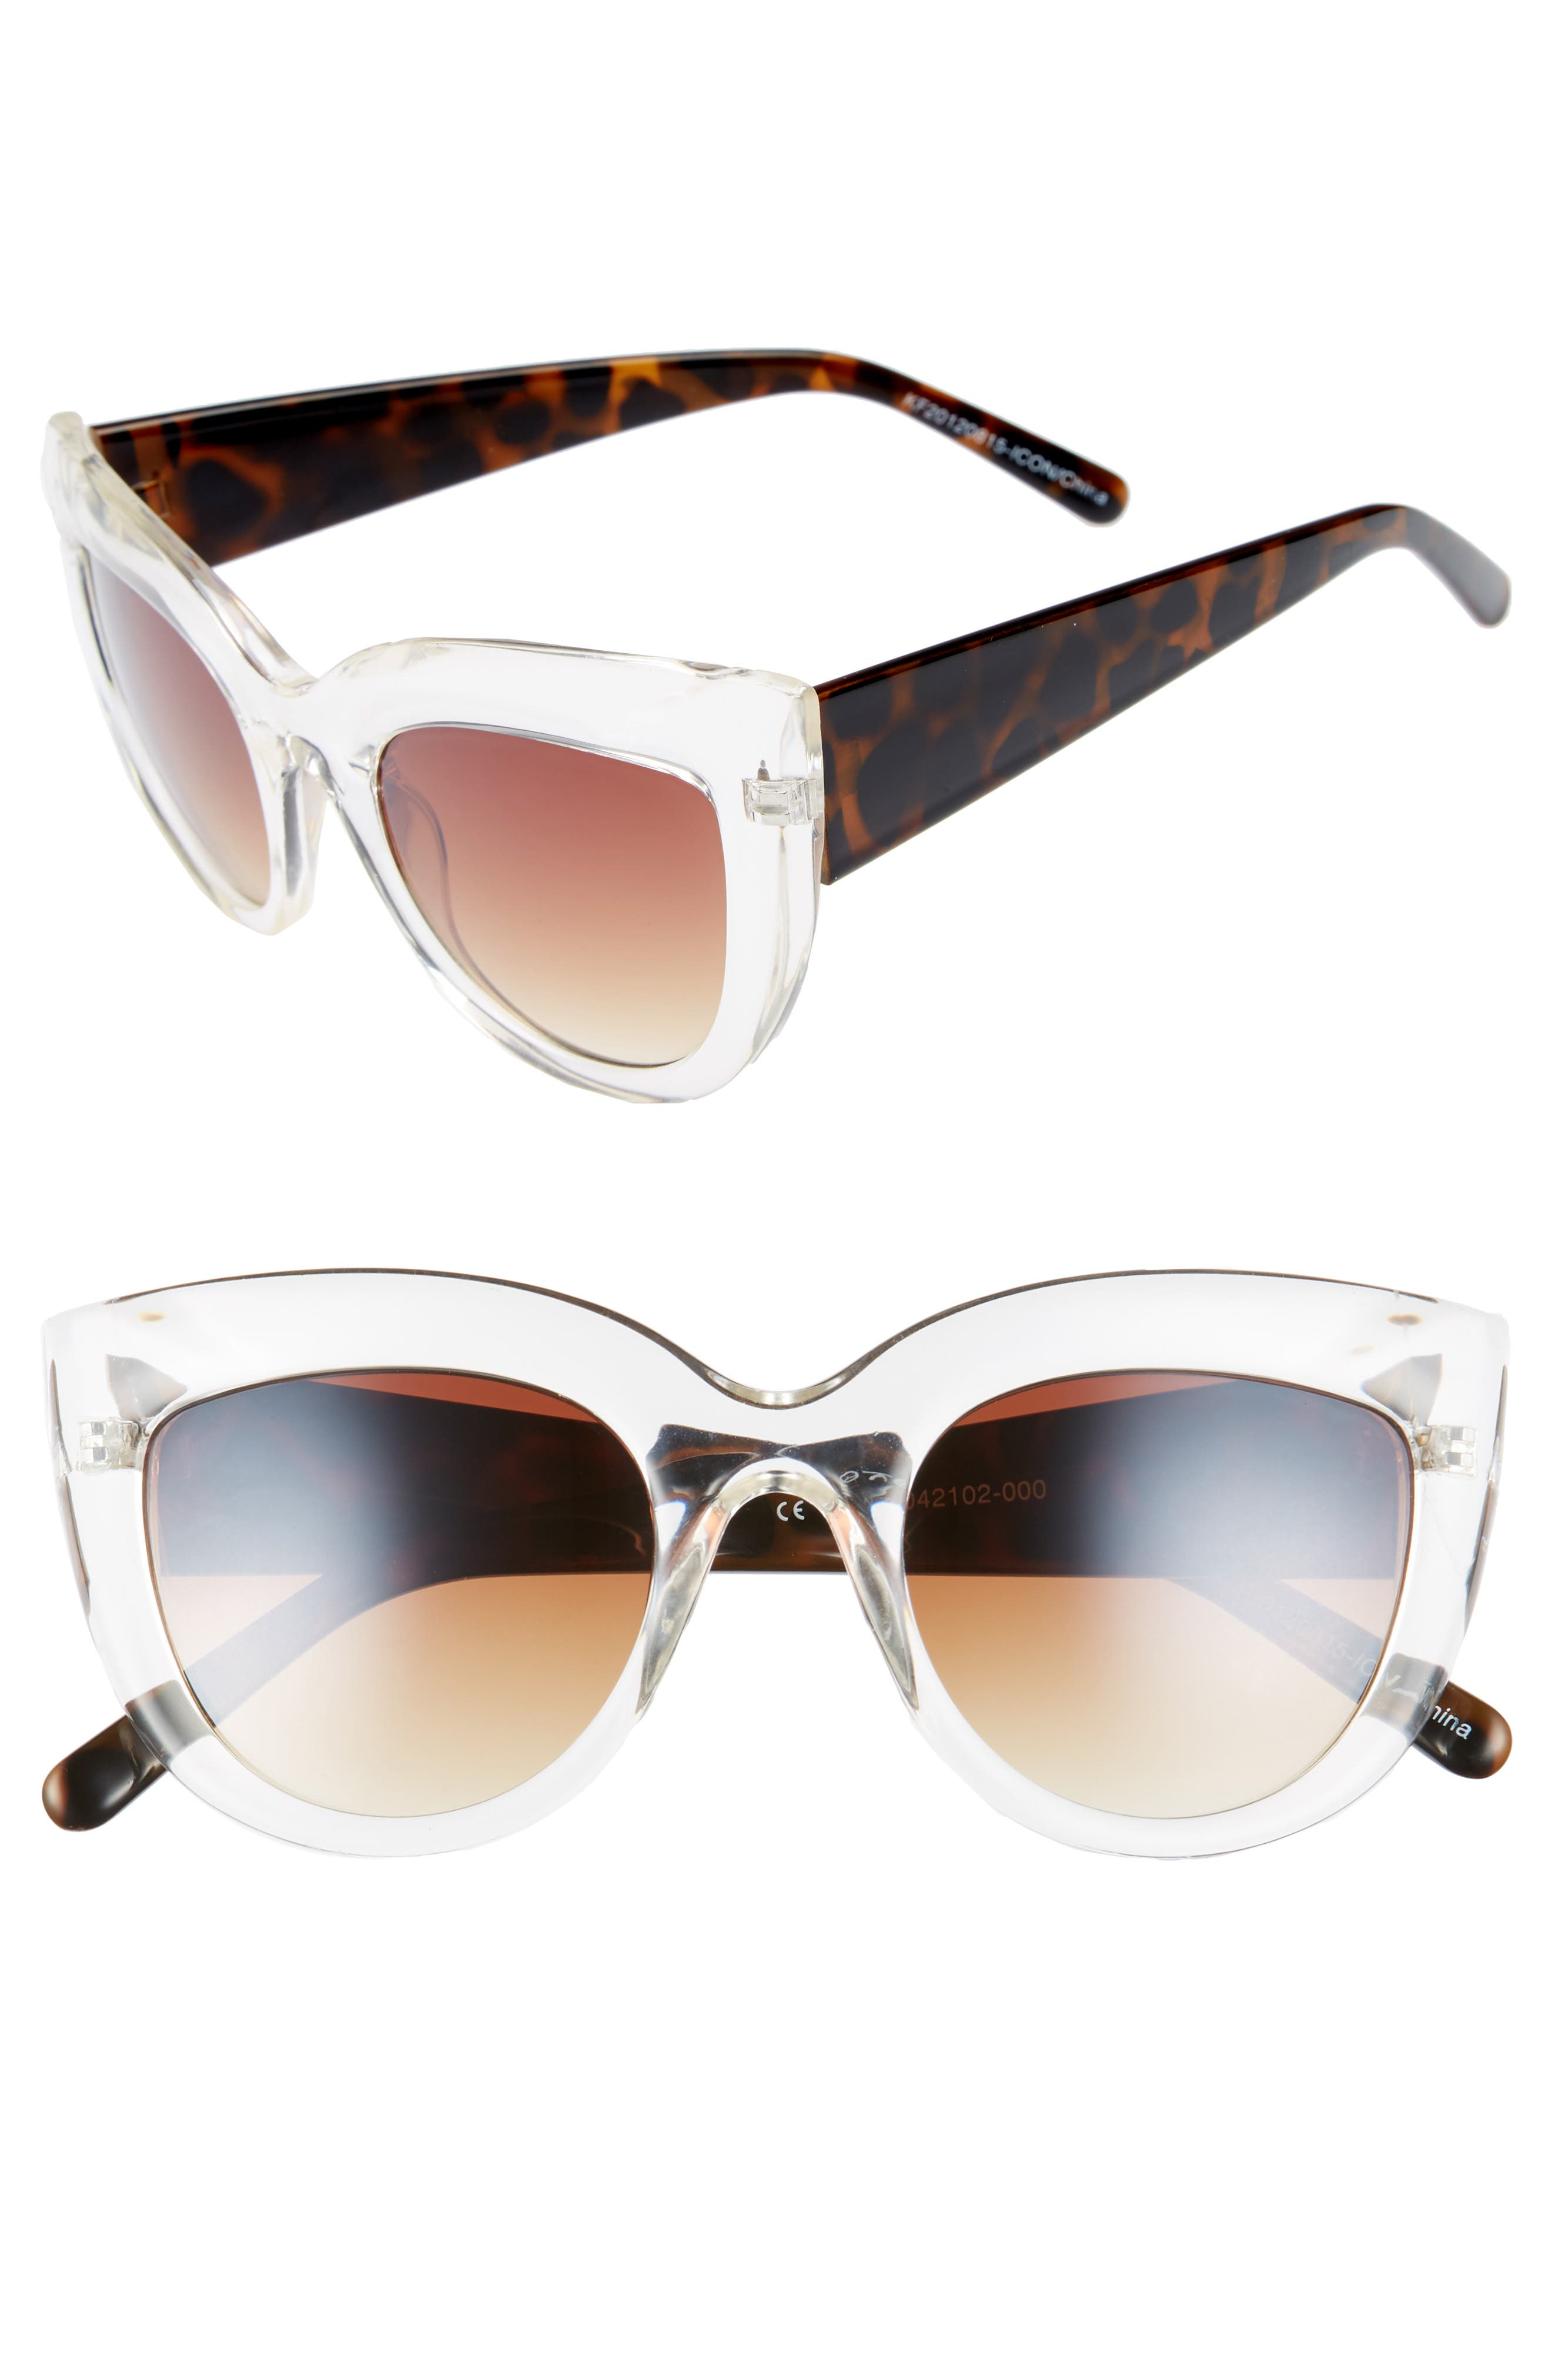 Translucent Cat Eye Sunglasses,                             Main thumbnail 1, color,                             Tort/ Clear